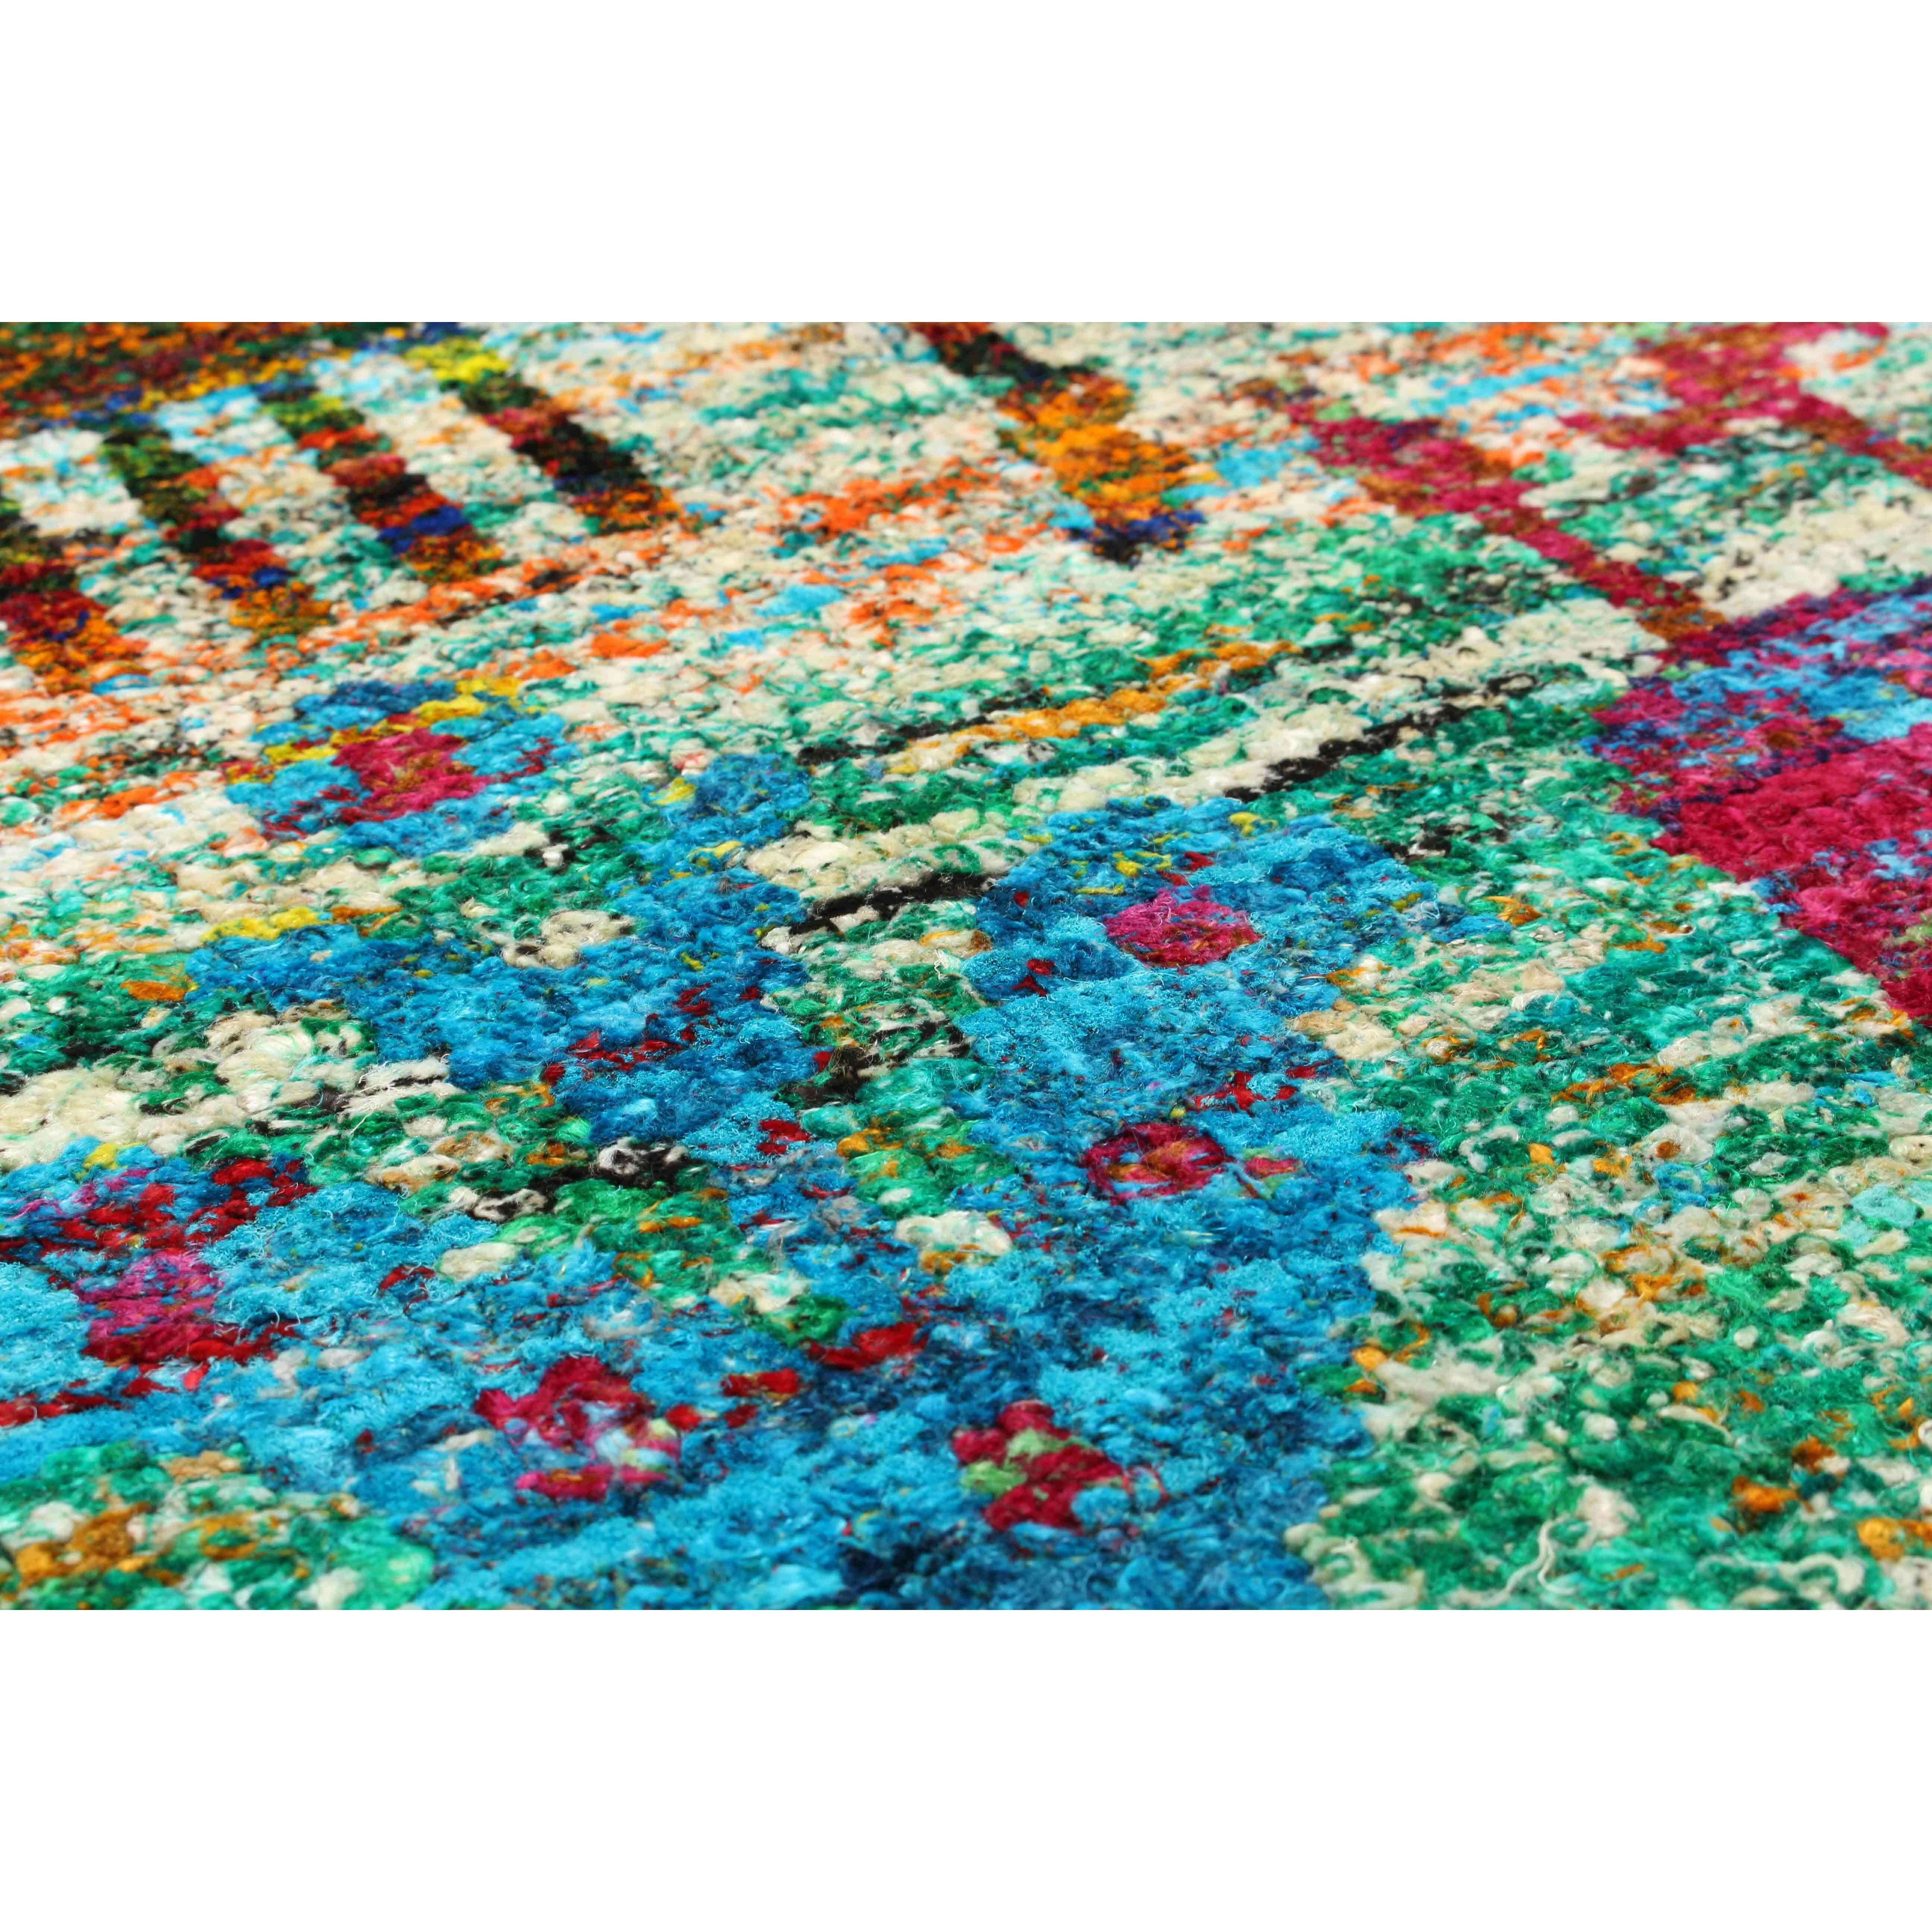 hand knotted blue green red area rug wayfair. Black Bedroom Furniture Sets. Home Design Ideas